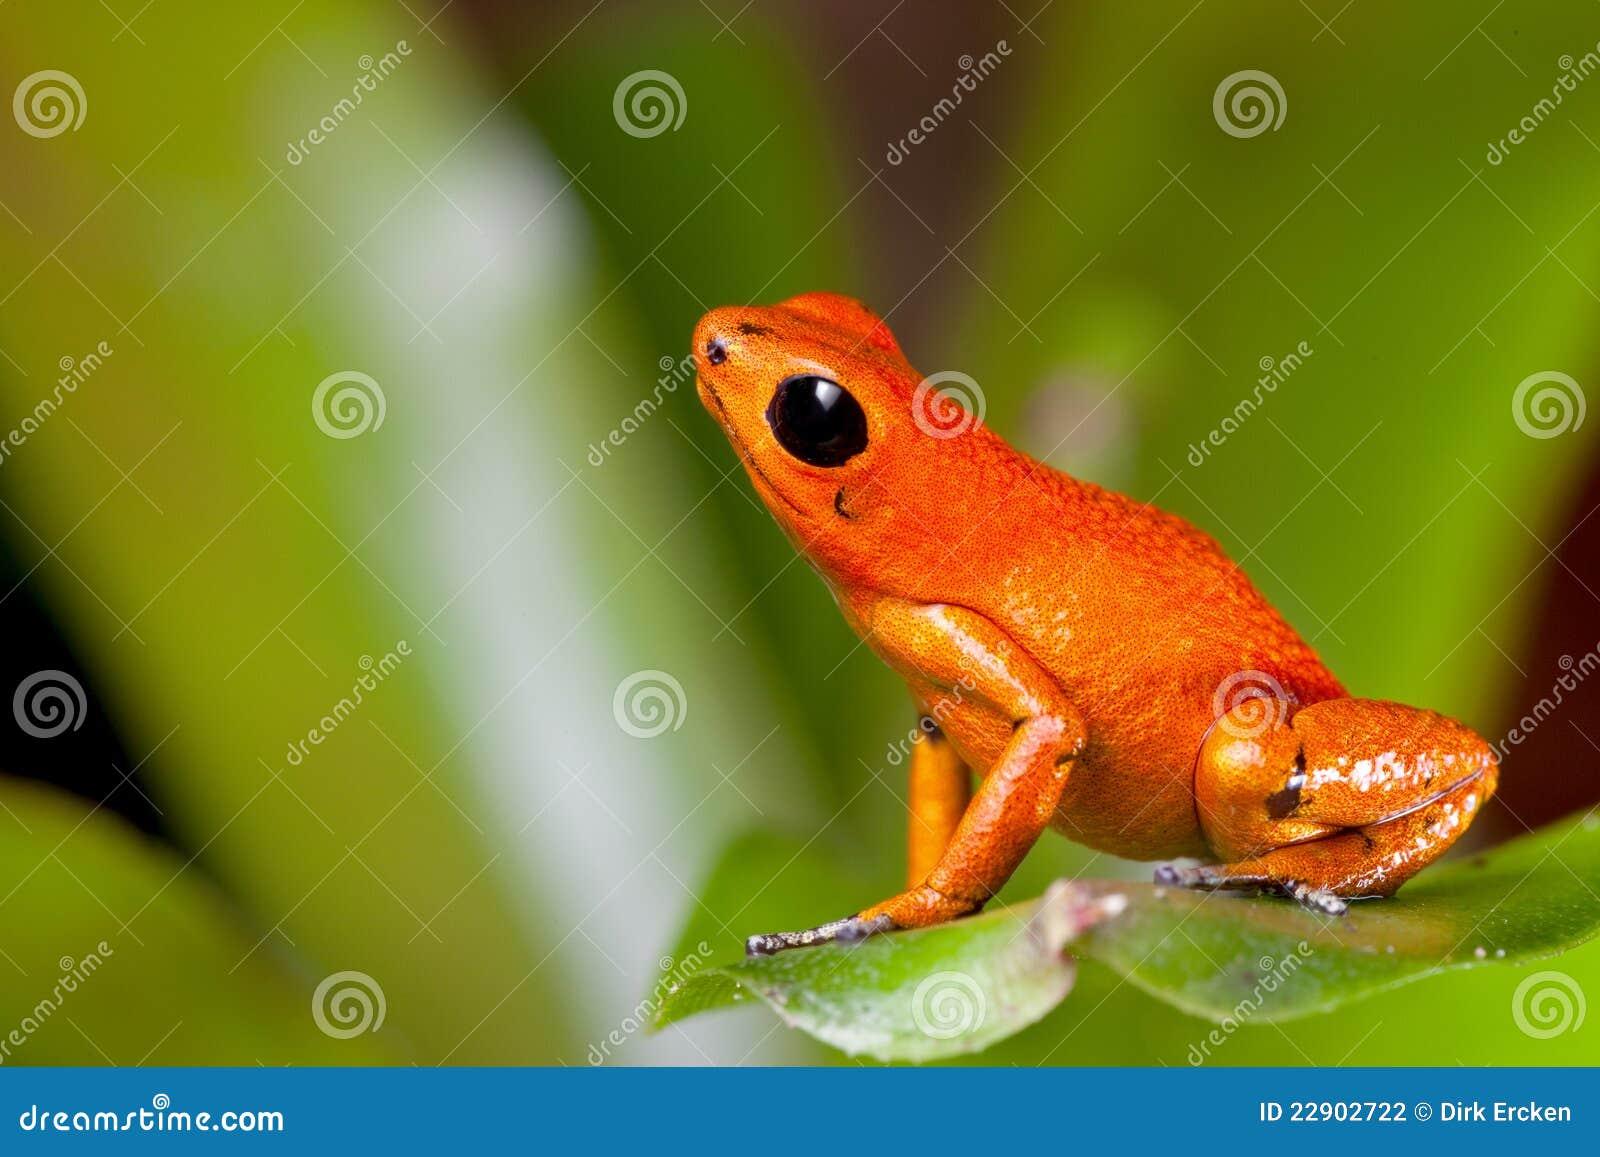 Rana anaranjada del dardo del veneno